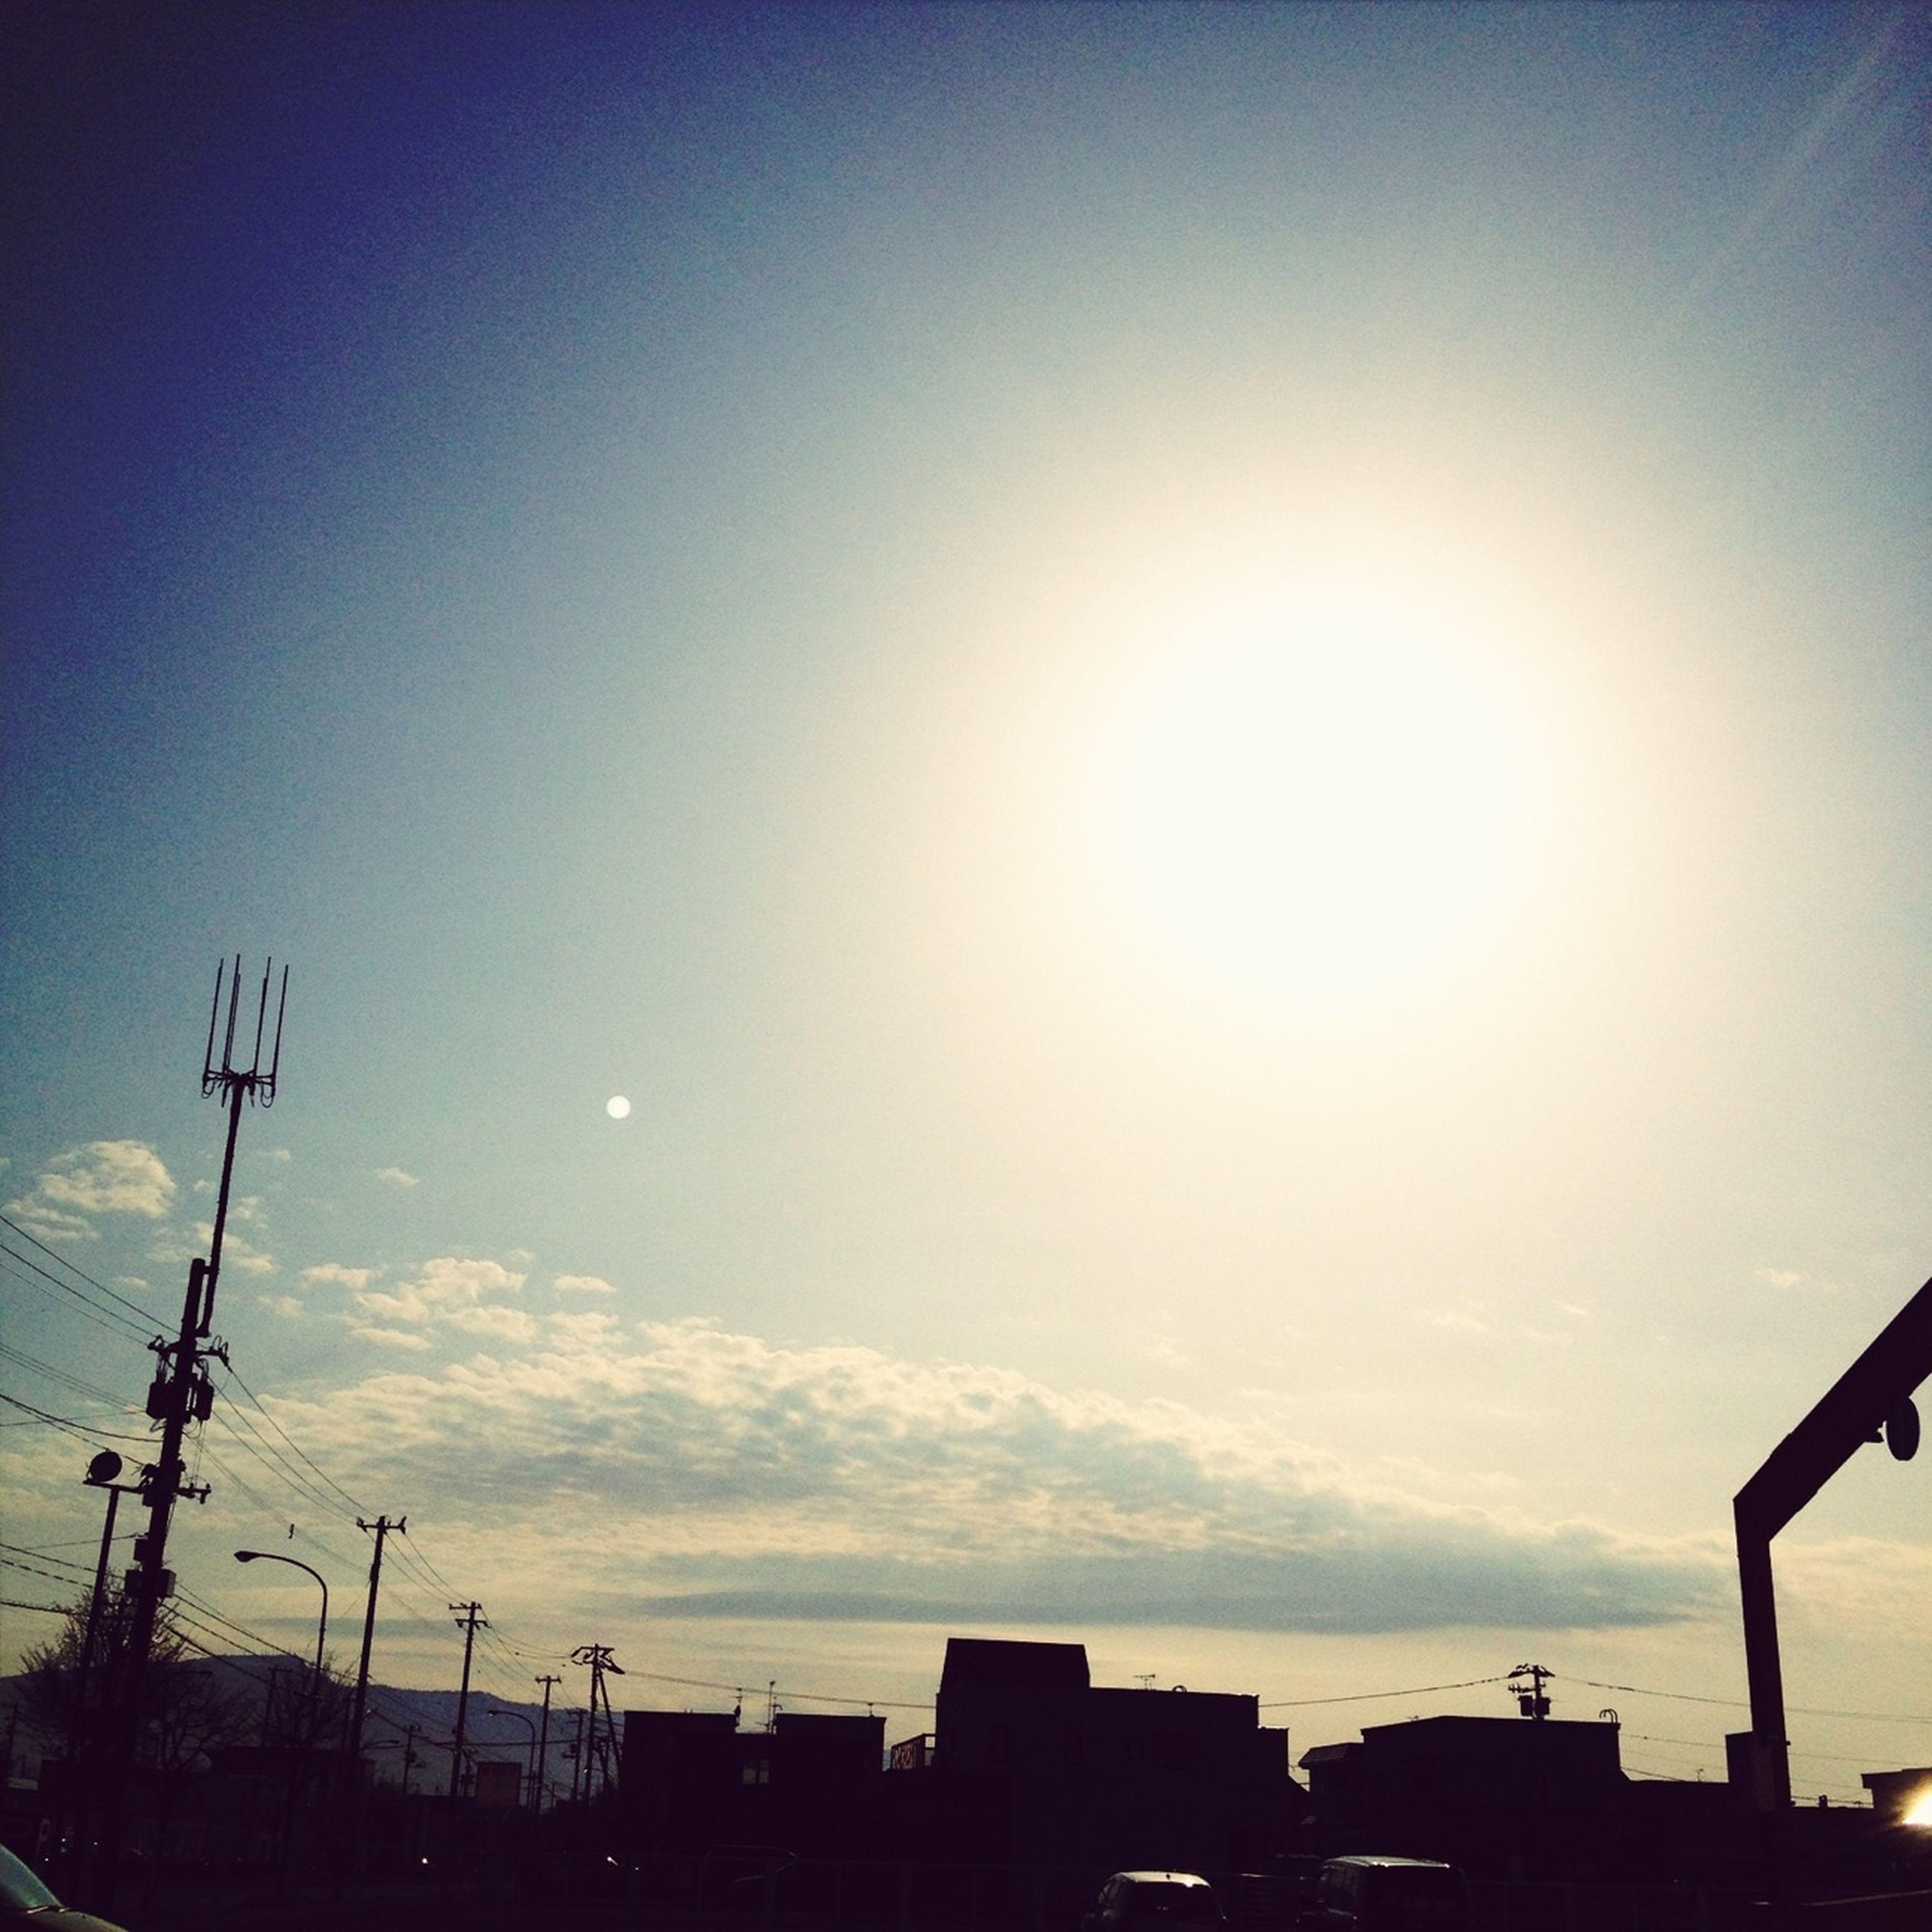 sun, transportation, sunbeam, sunlight, mode of transport, lens flare, car, sky, land vehicle, silhouette, clear sky, sunset, street light, built structure, bright, outdoors, copy space, sunny, building exterior, road